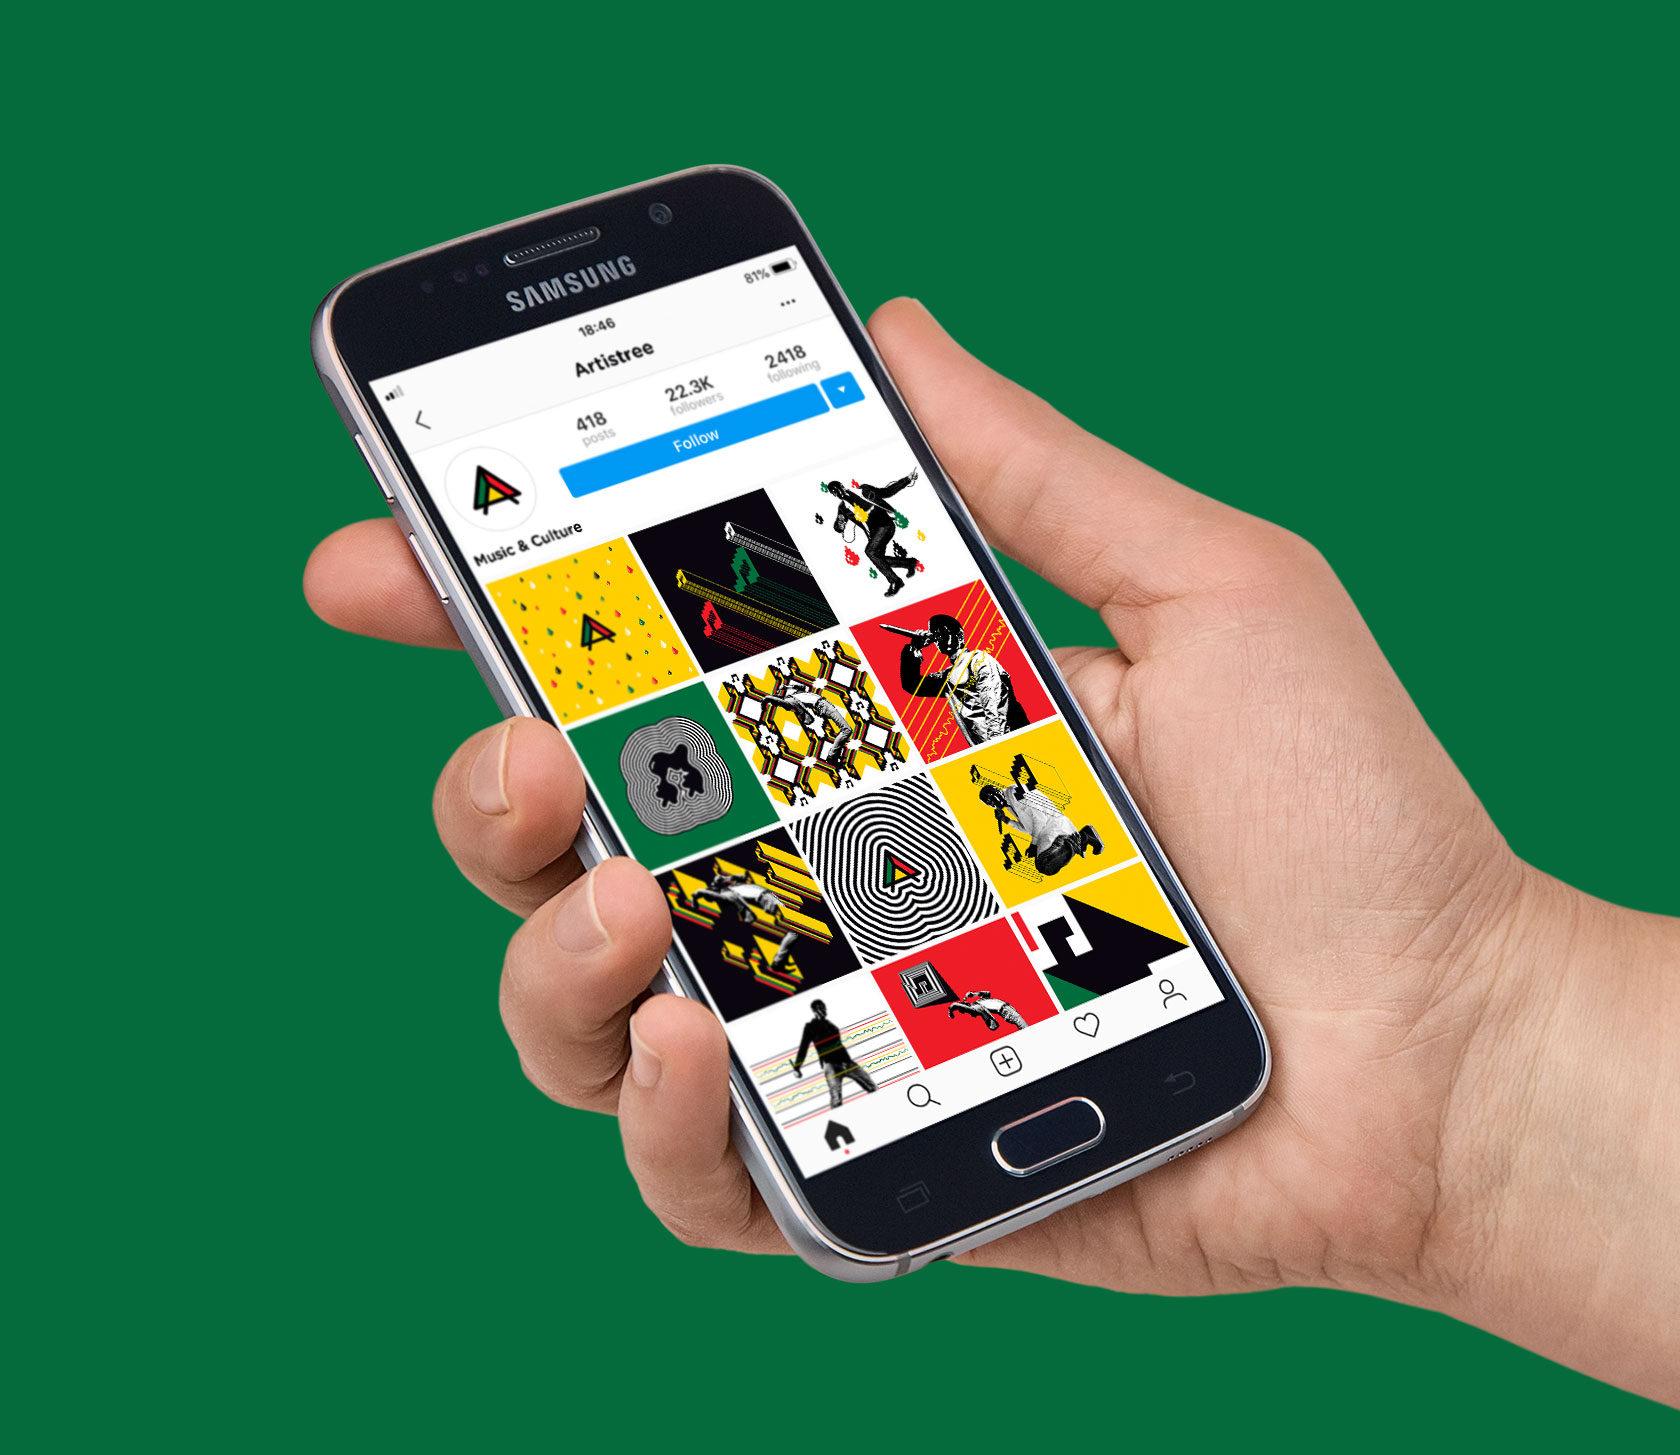 Artistree-social-media-content-design-by-Furia